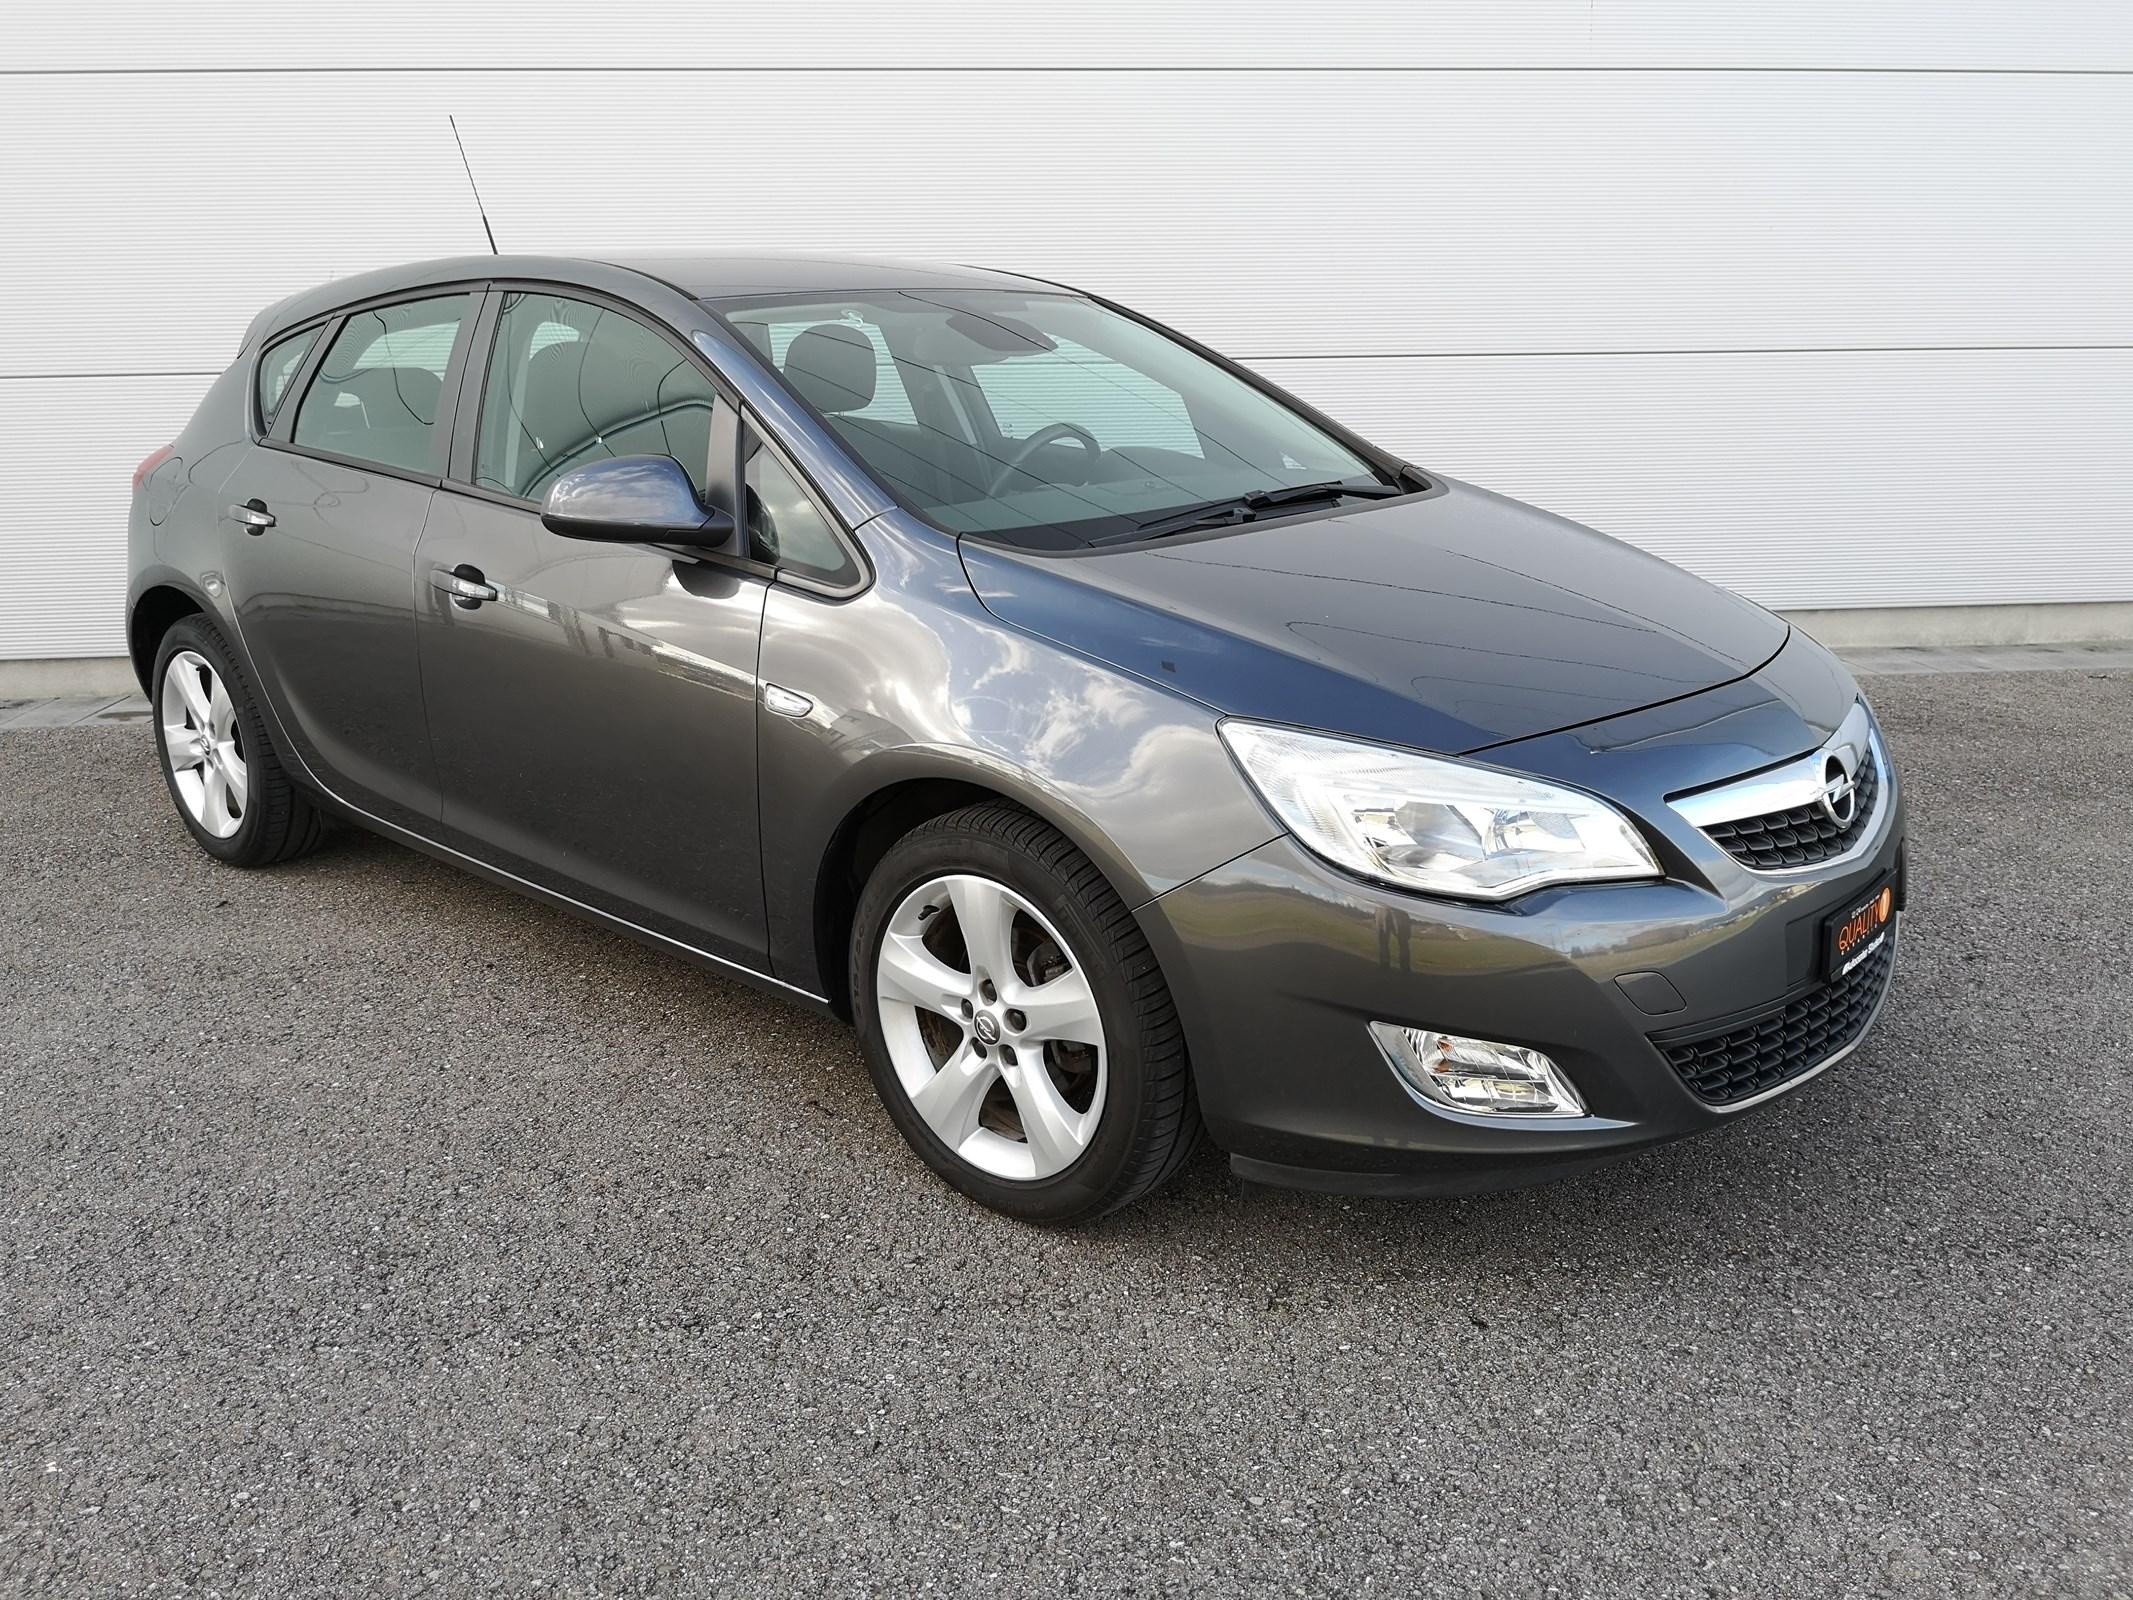 Buy Used Car Sedan Opel Astra 1 6i 16v Enjoy 124000 Km At 6450 Chf On Carforyou Ch